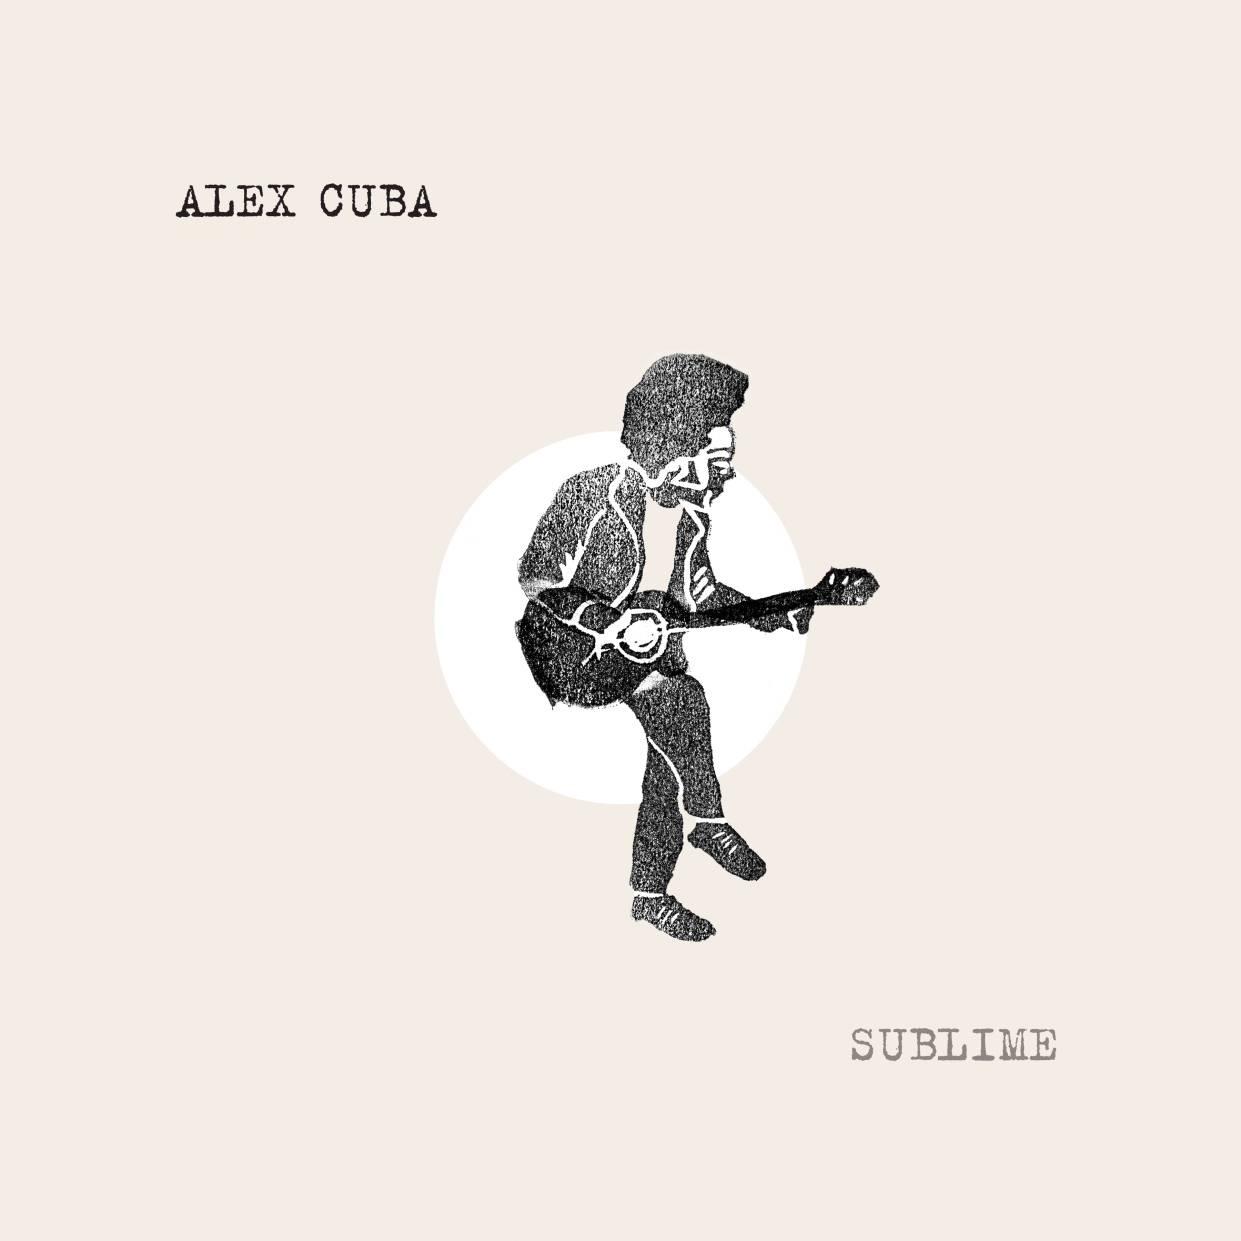 Portada del álbum Sublime, de Alex Cuba. Arte original de Erin Candela, portada diseñada por Simon Evers.